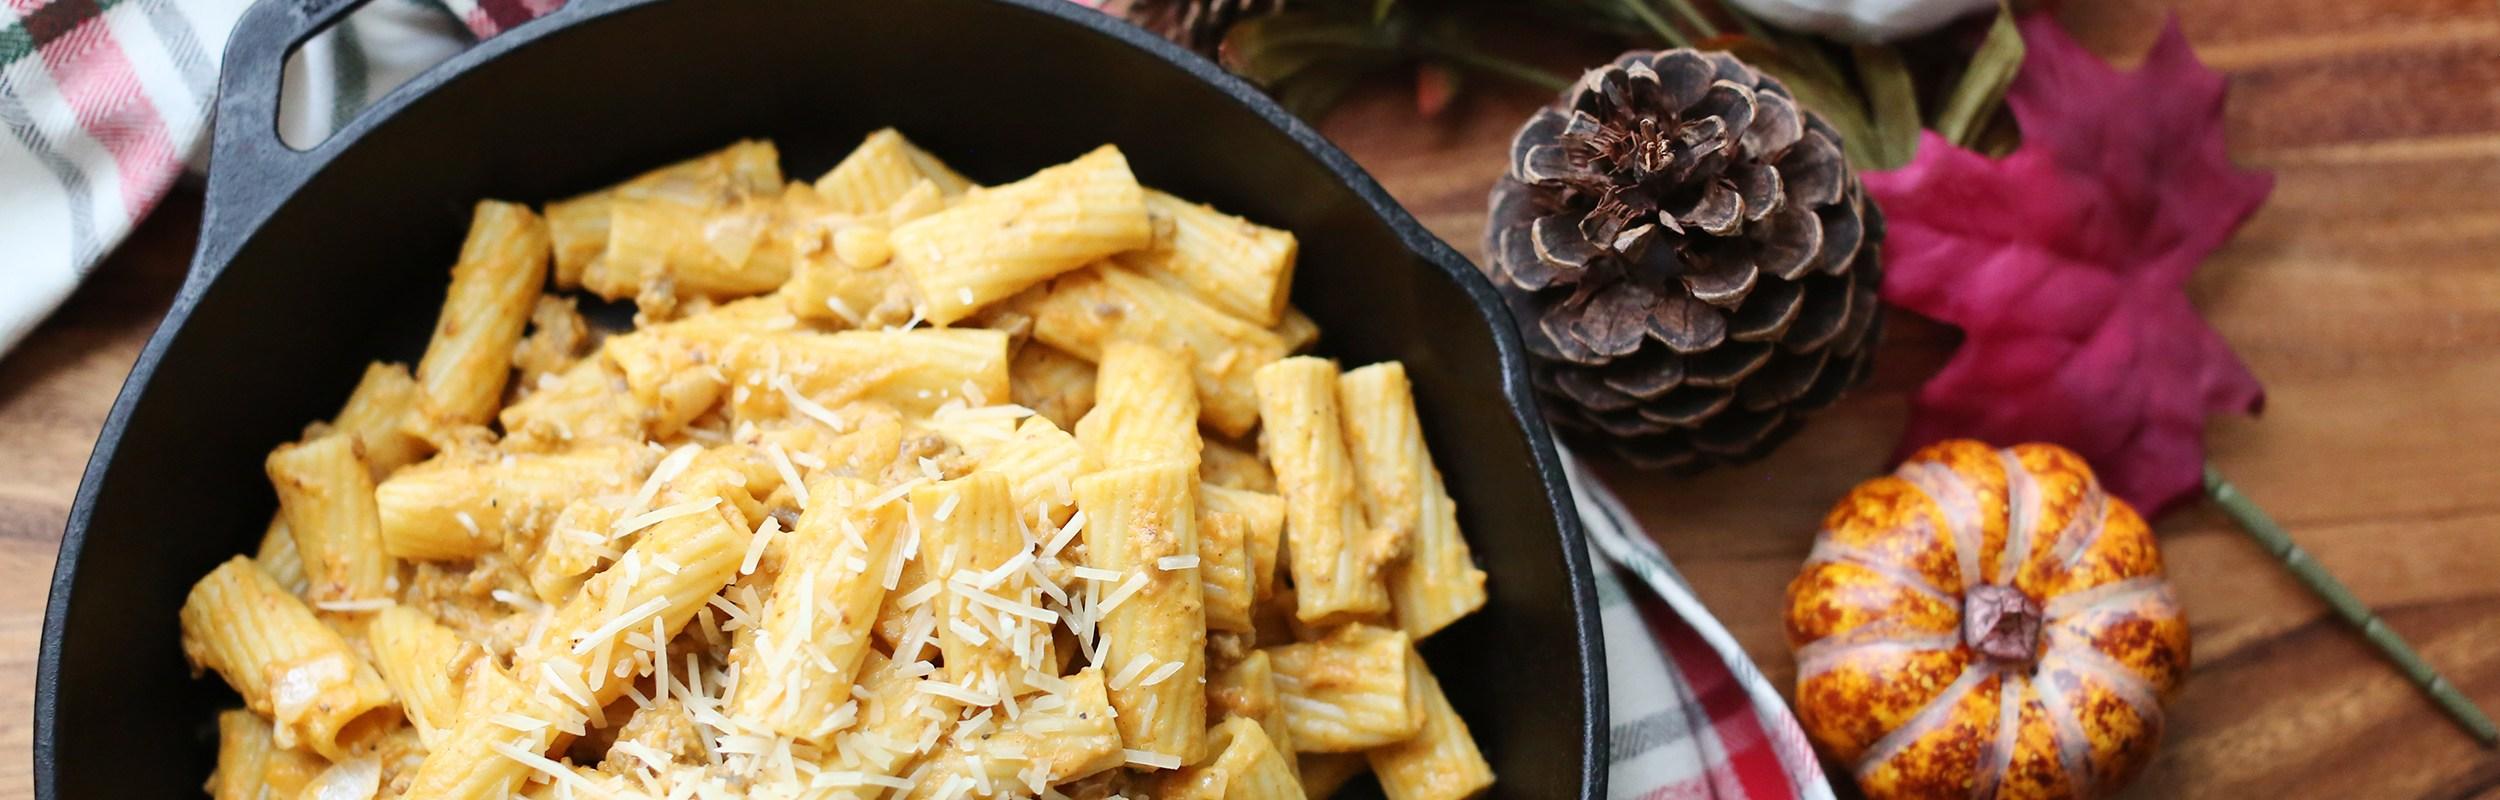 The Most Delicious And Popular Pumpkin Pasta Recipe healthyaiblog.com